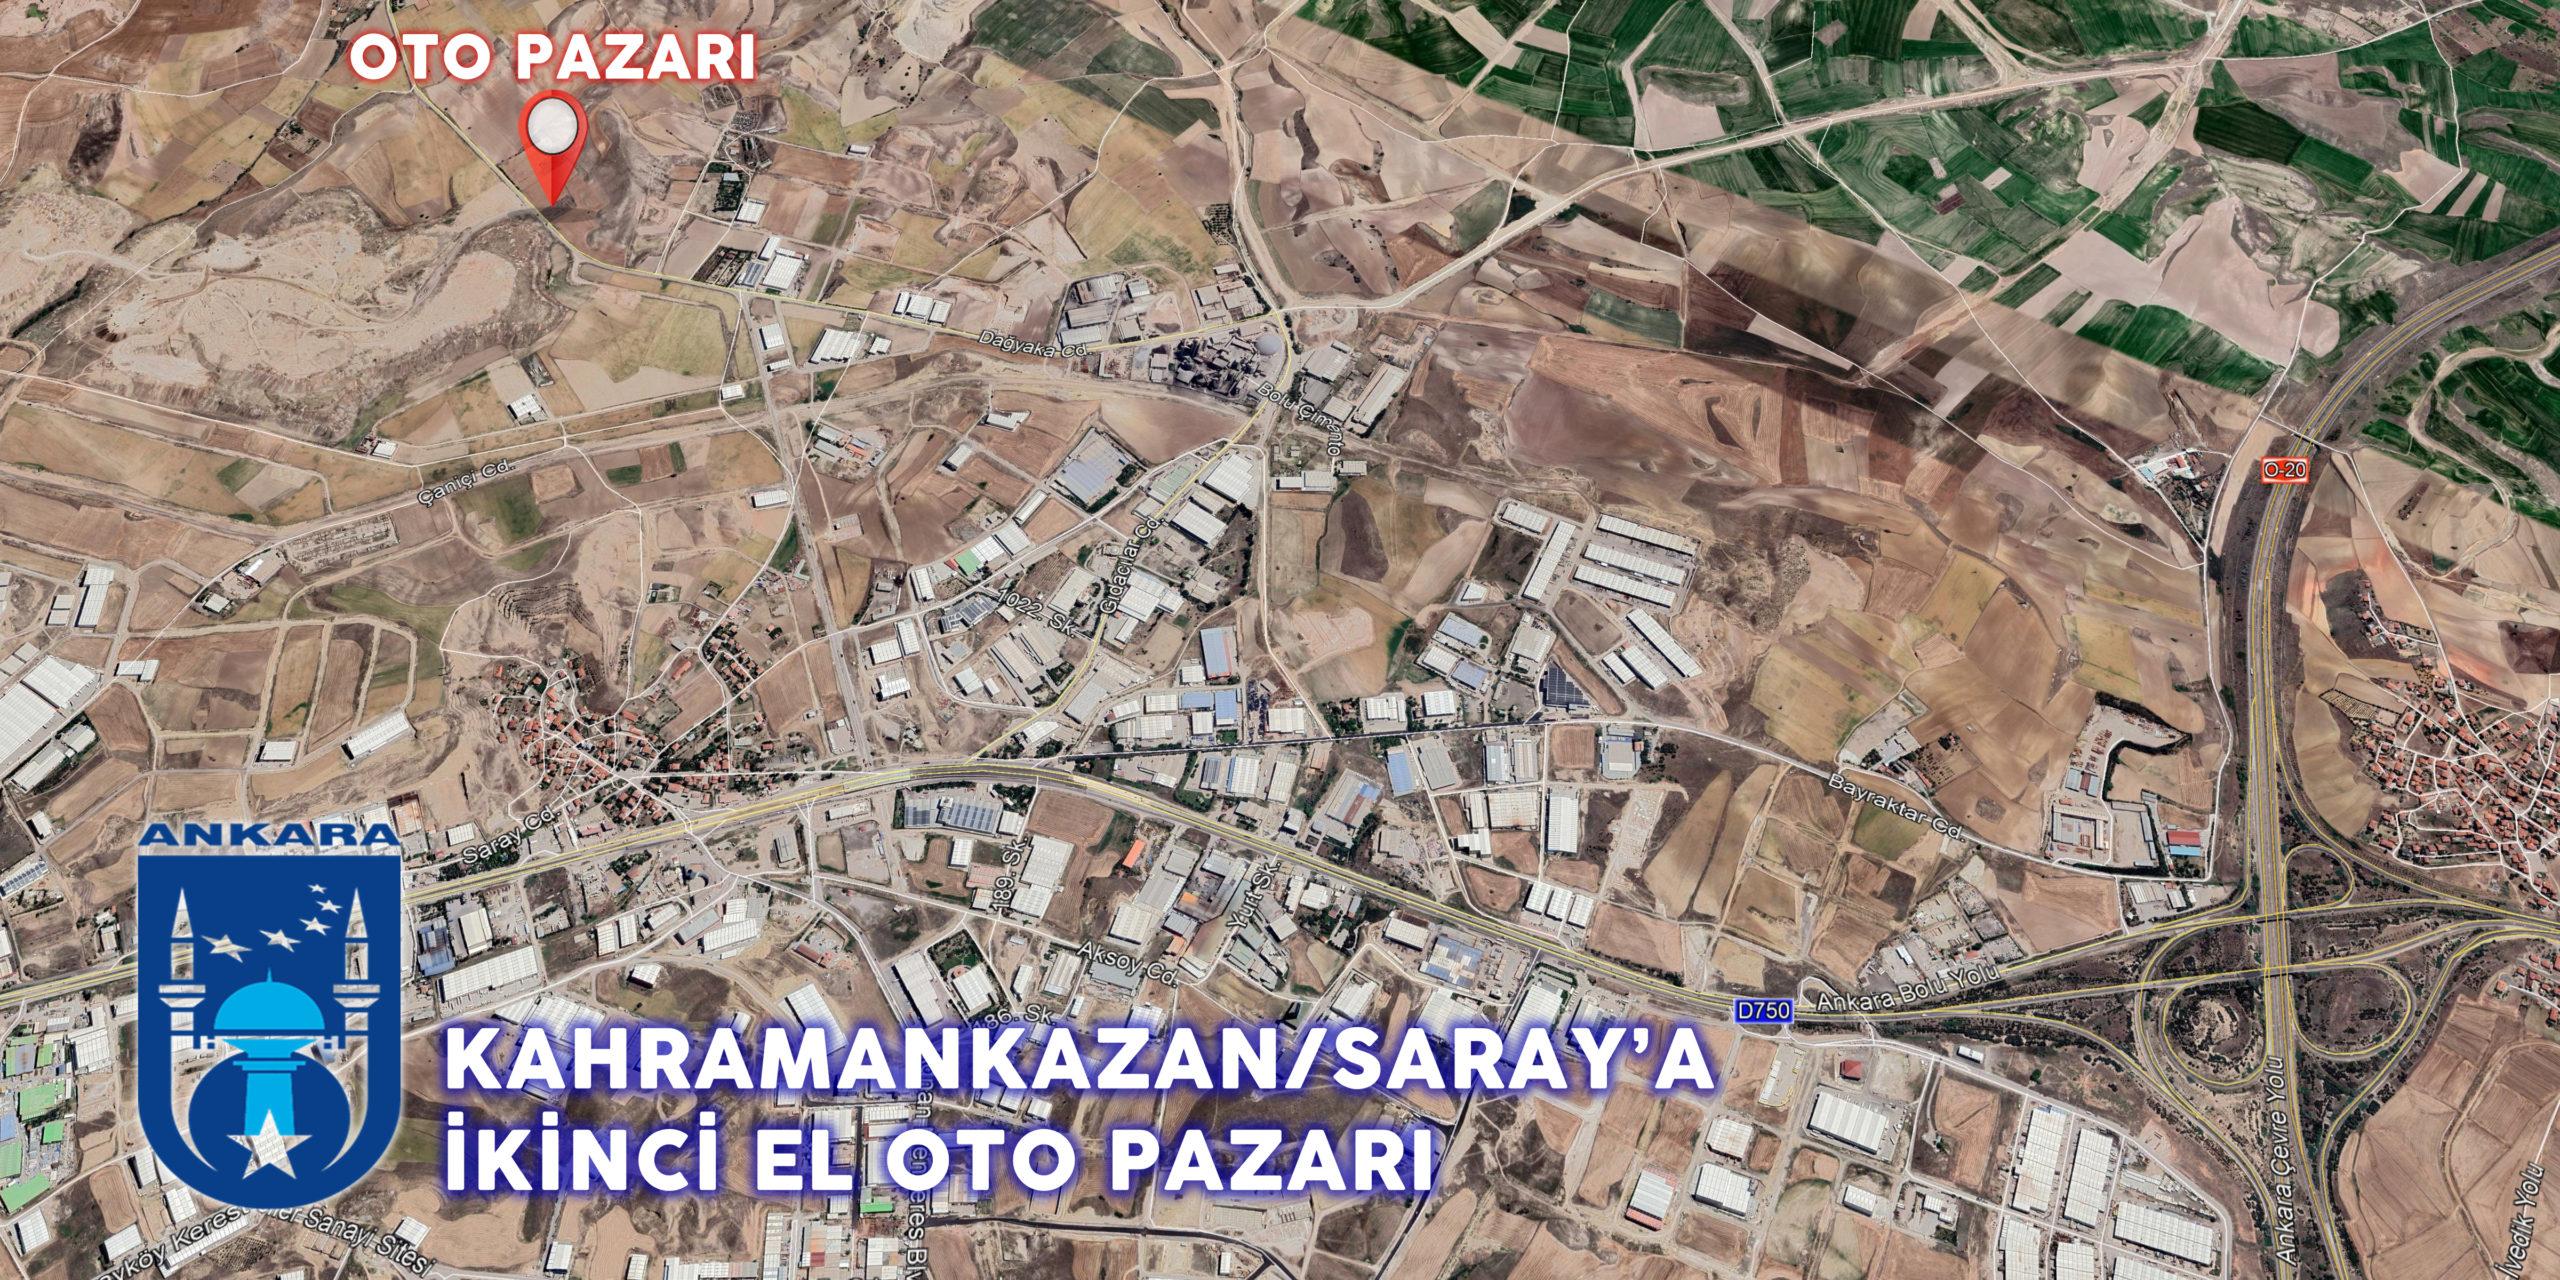 Kahramankazan/Saray'a, İkinci El Oto Pazarı…